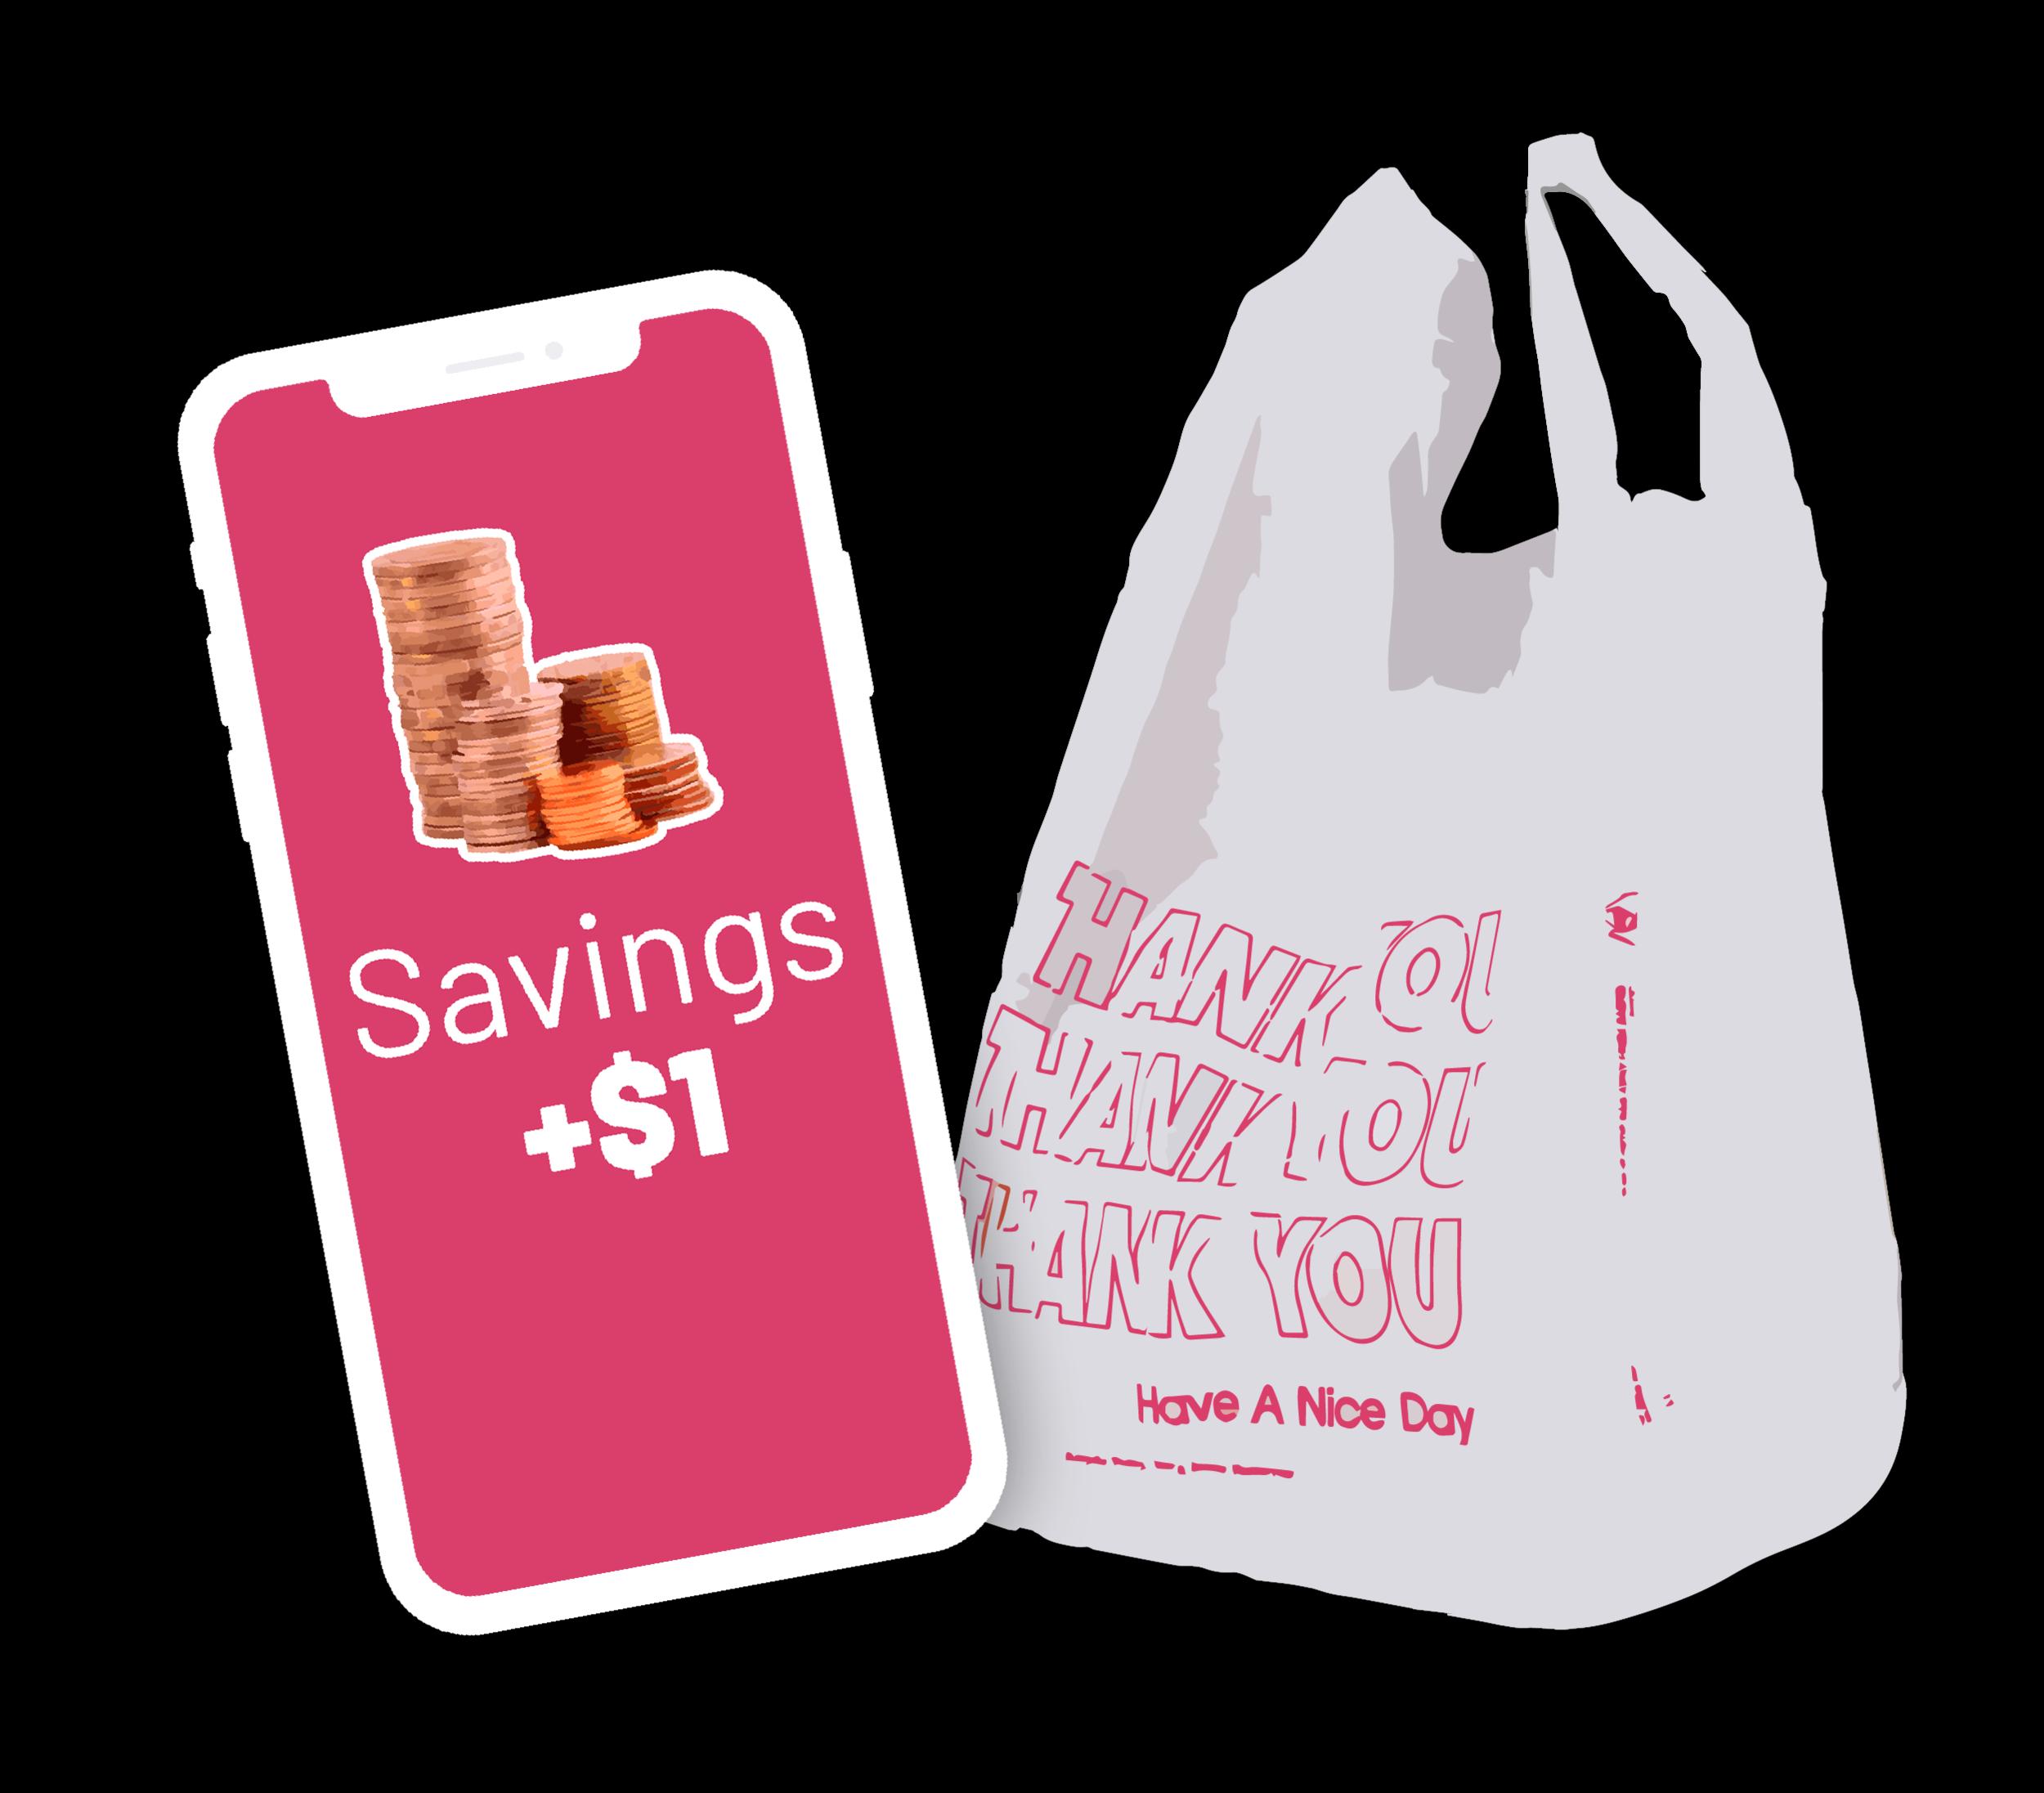 saving_grifin_invest_save_fintech_$1up_roundup.png